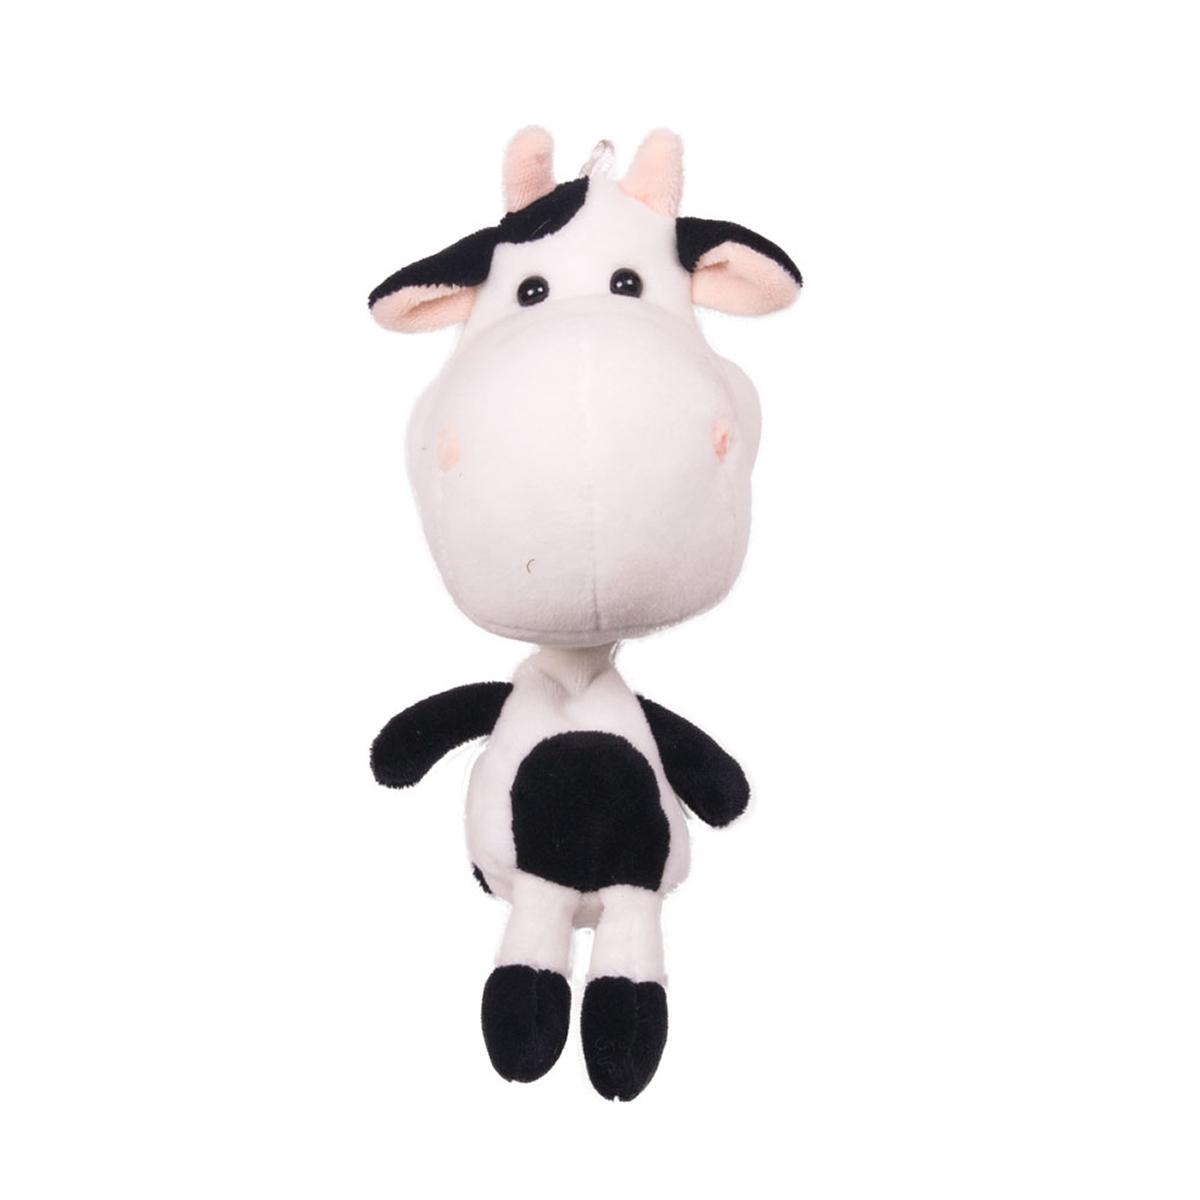 Button Blue мягкая игрушка Подвеска - Корова